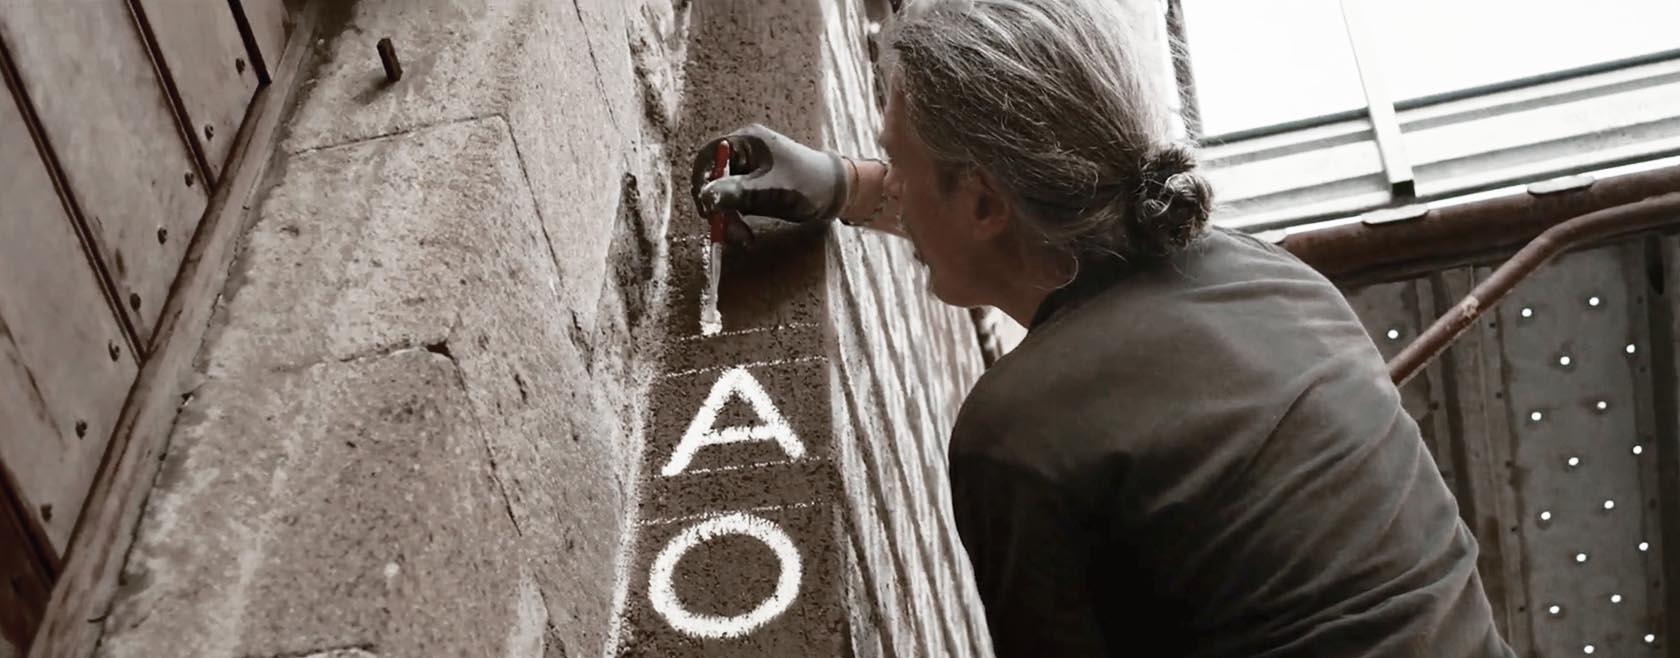 Copertina del documentario - Marte (GAZA) - Ciclope film